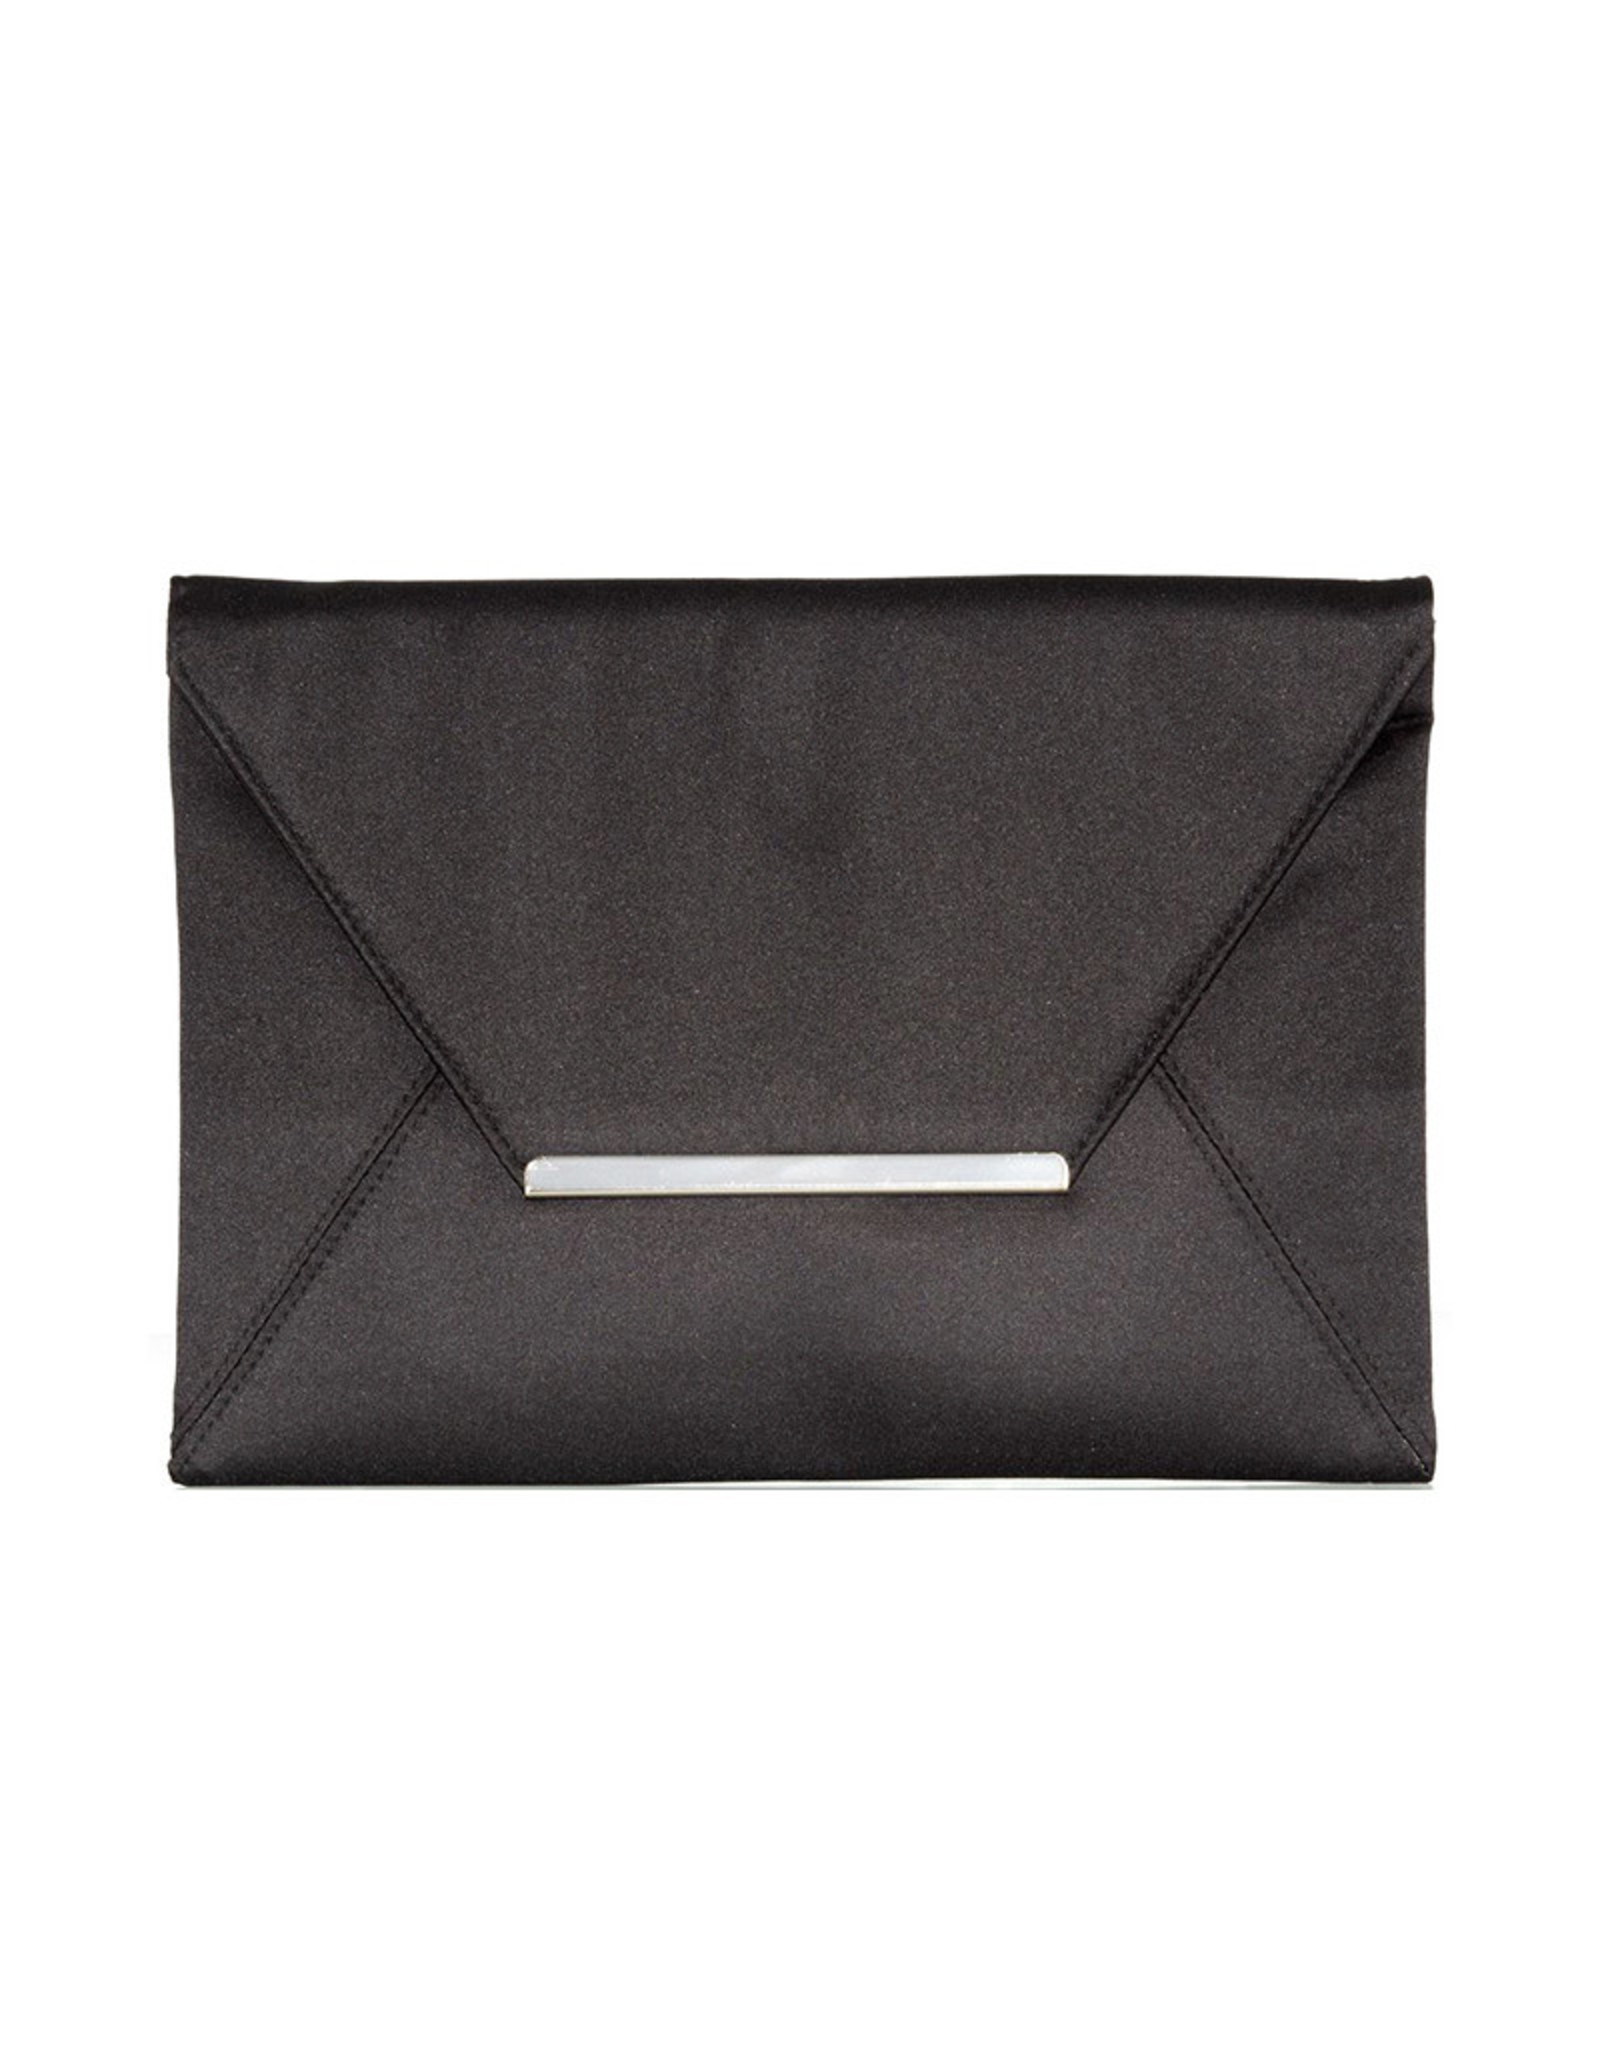 Gabee Products Amy Matt satin Envelope Clutch - Black